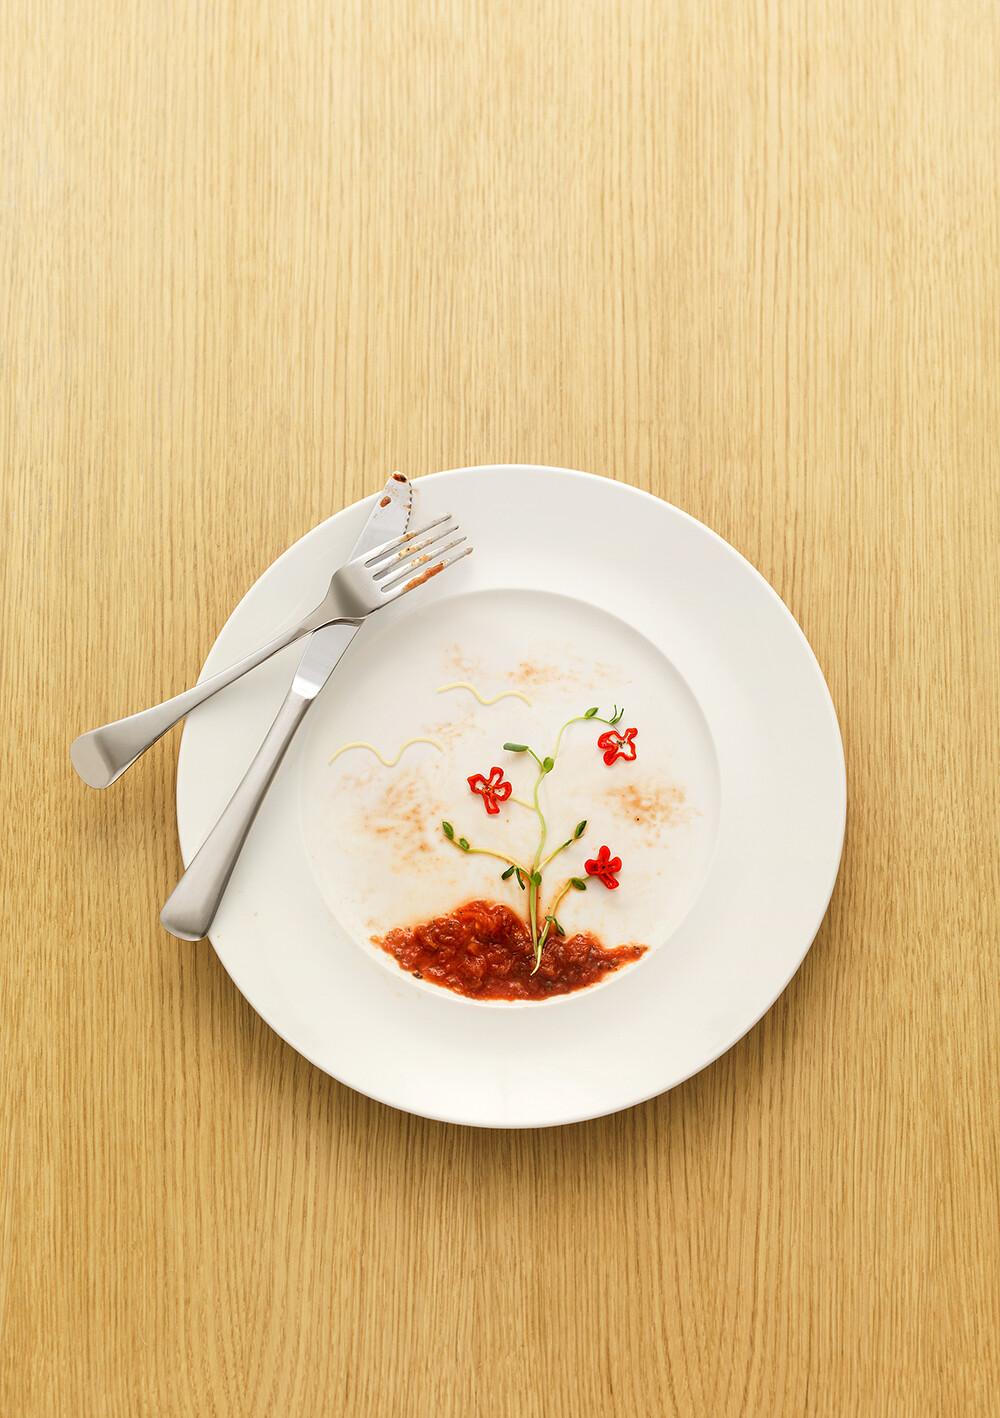 Alexander crispin lantmännen foodart flowers